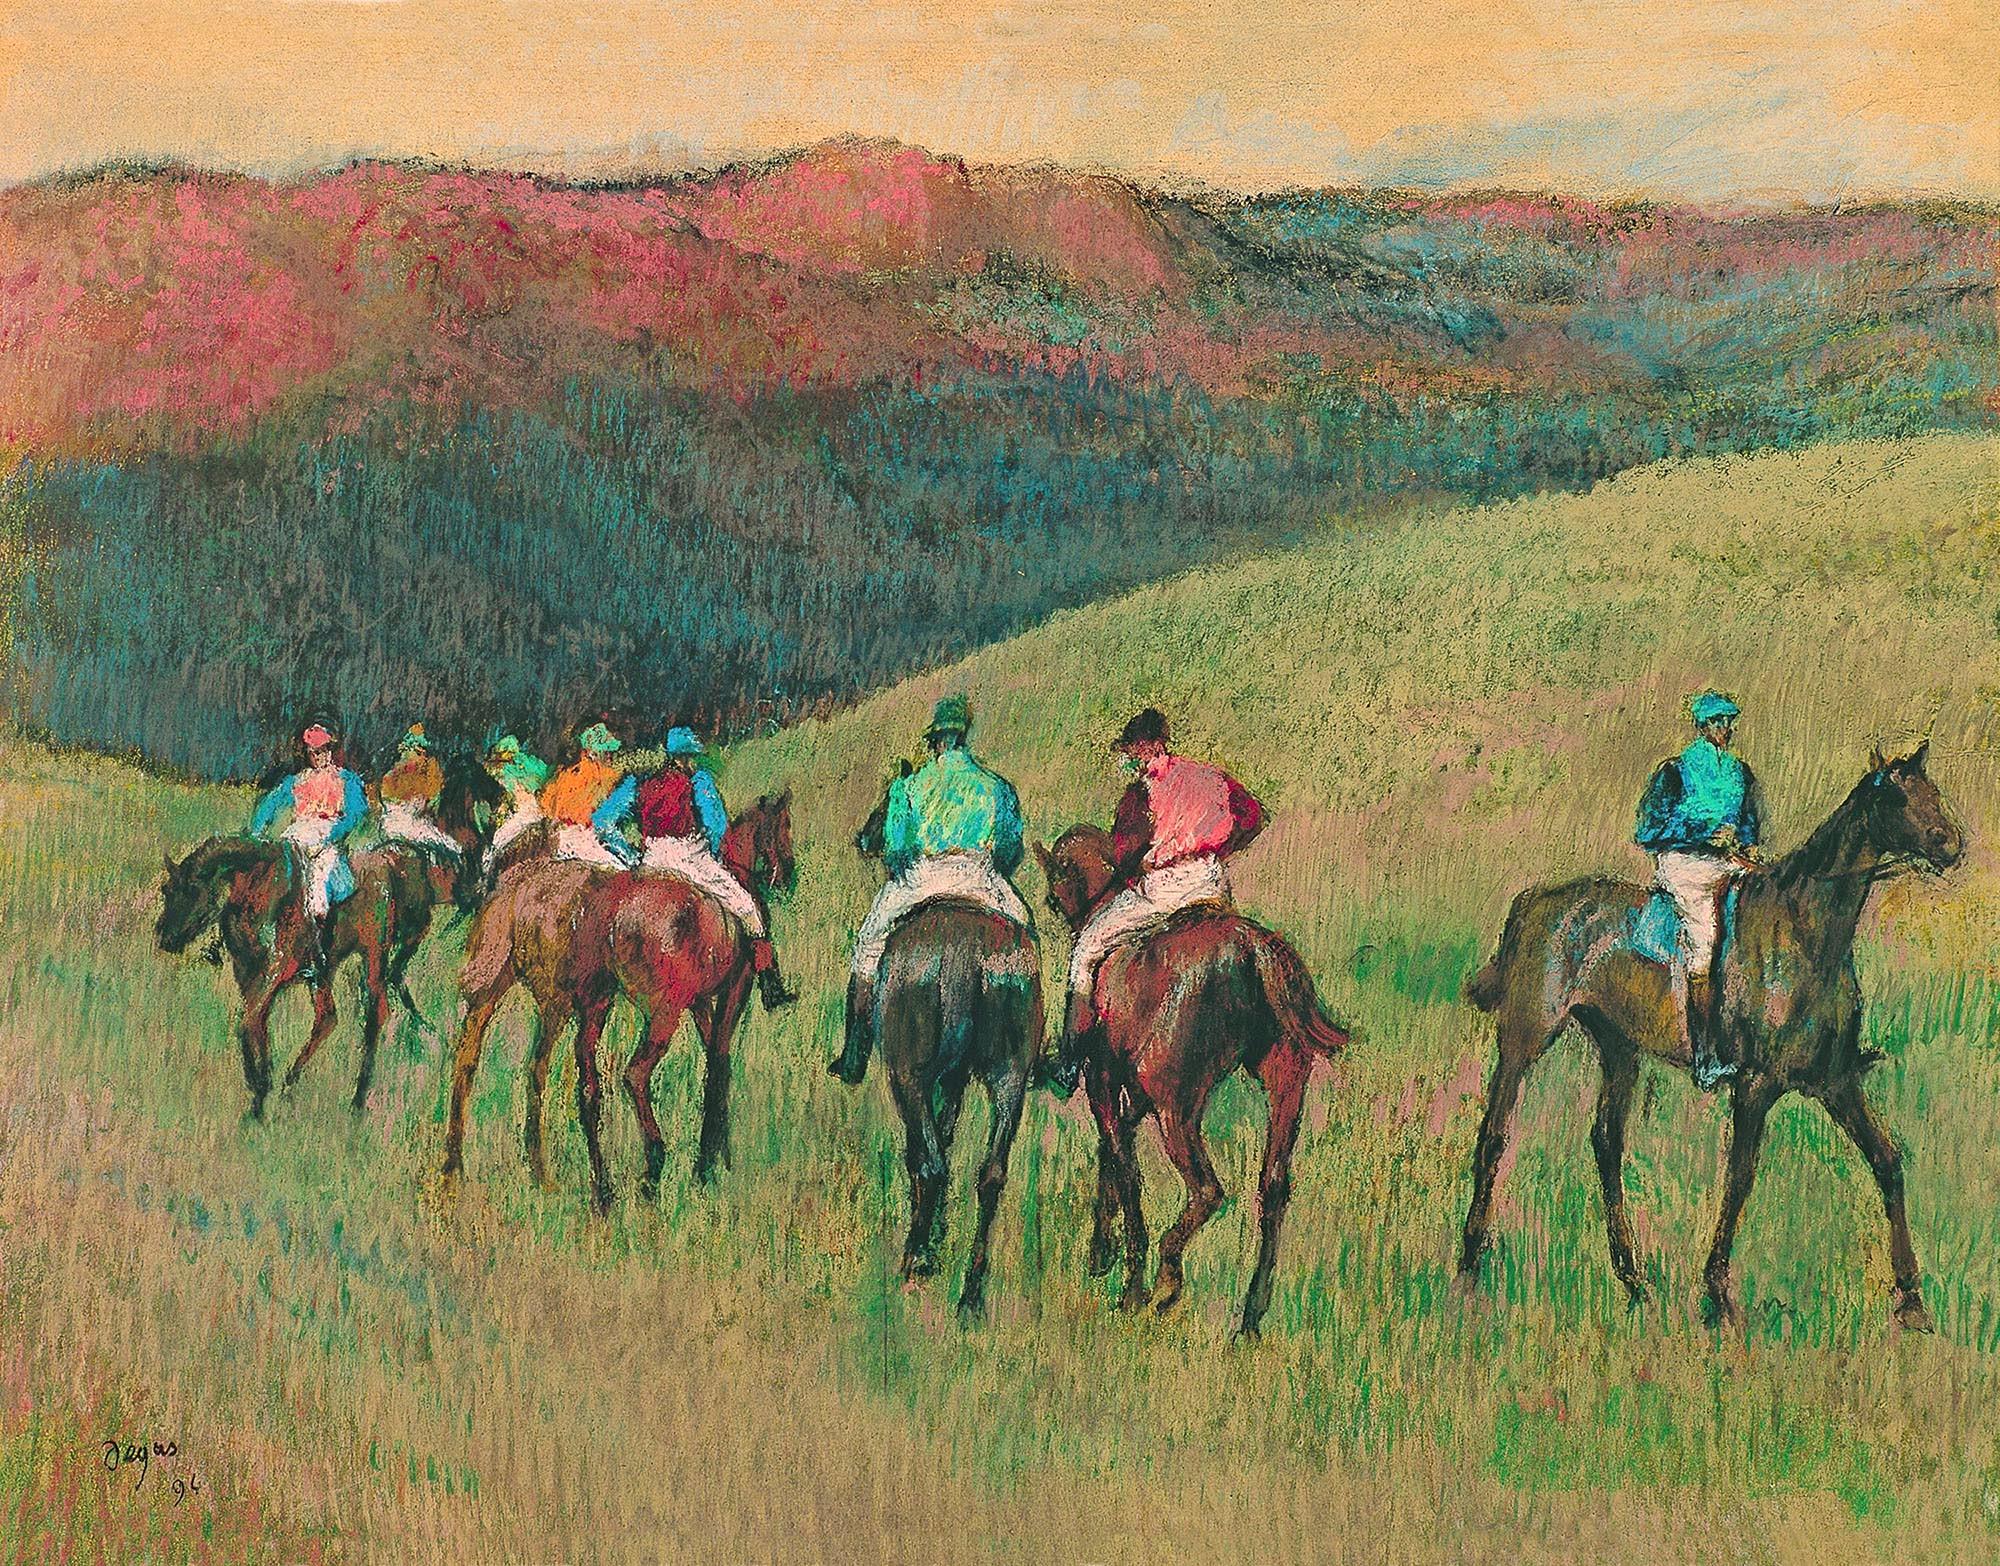 Degas - Racehorses in a landscape